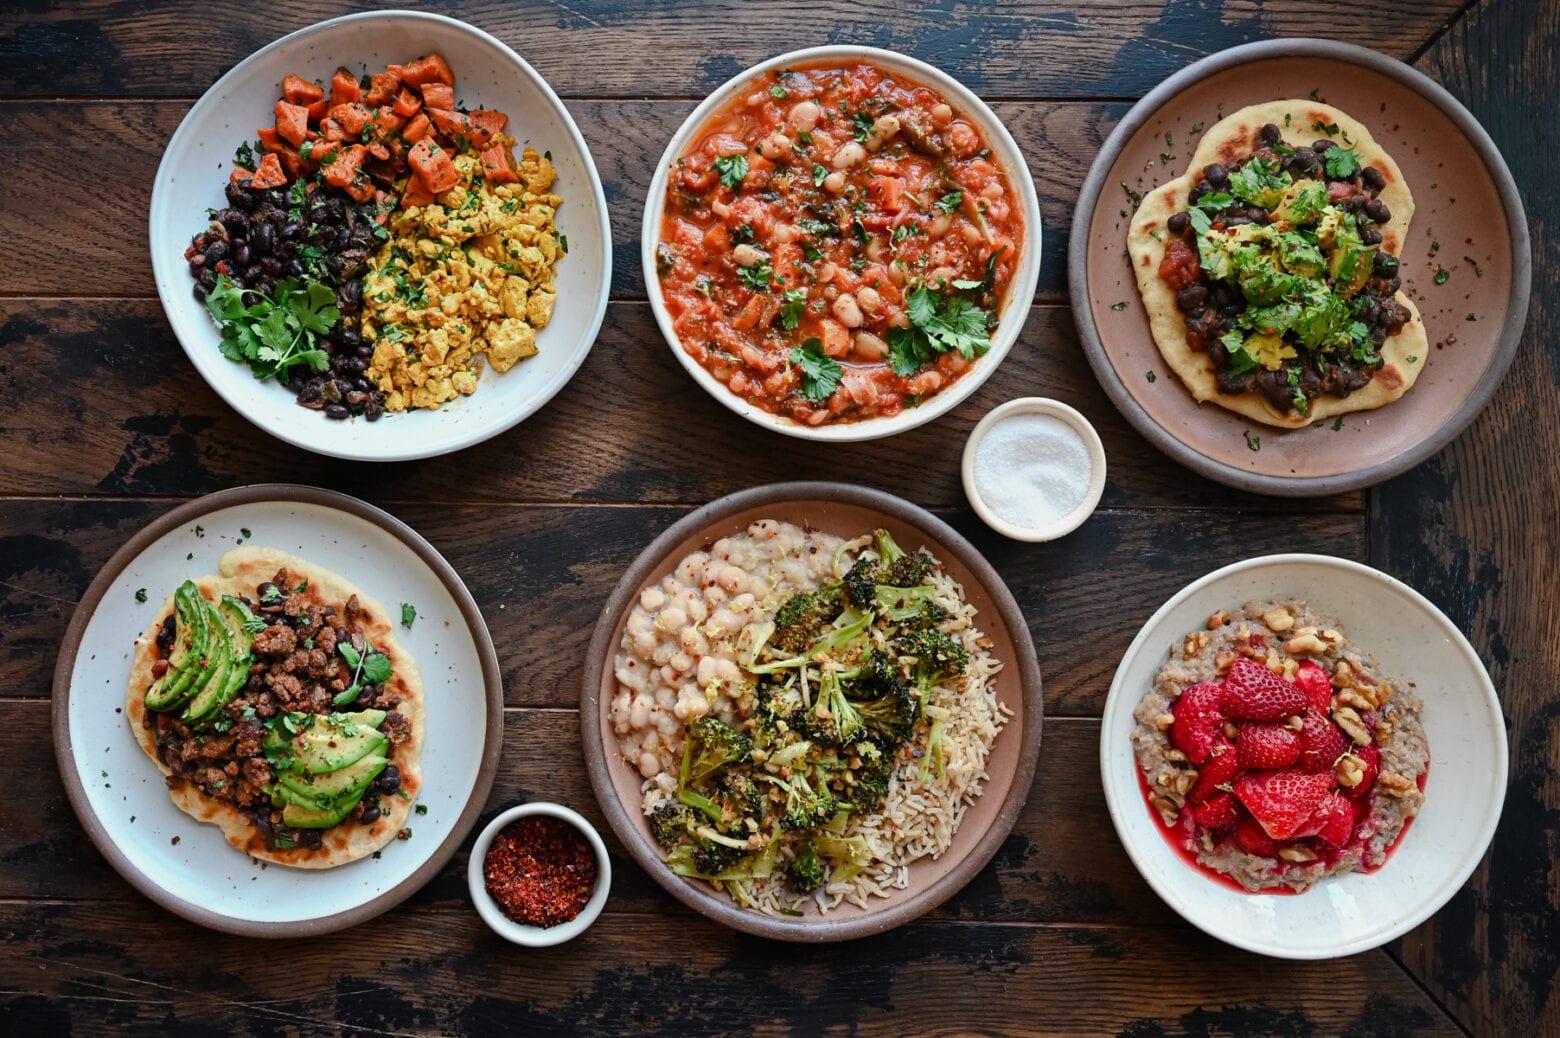 6 vegan meals meals on wooden table